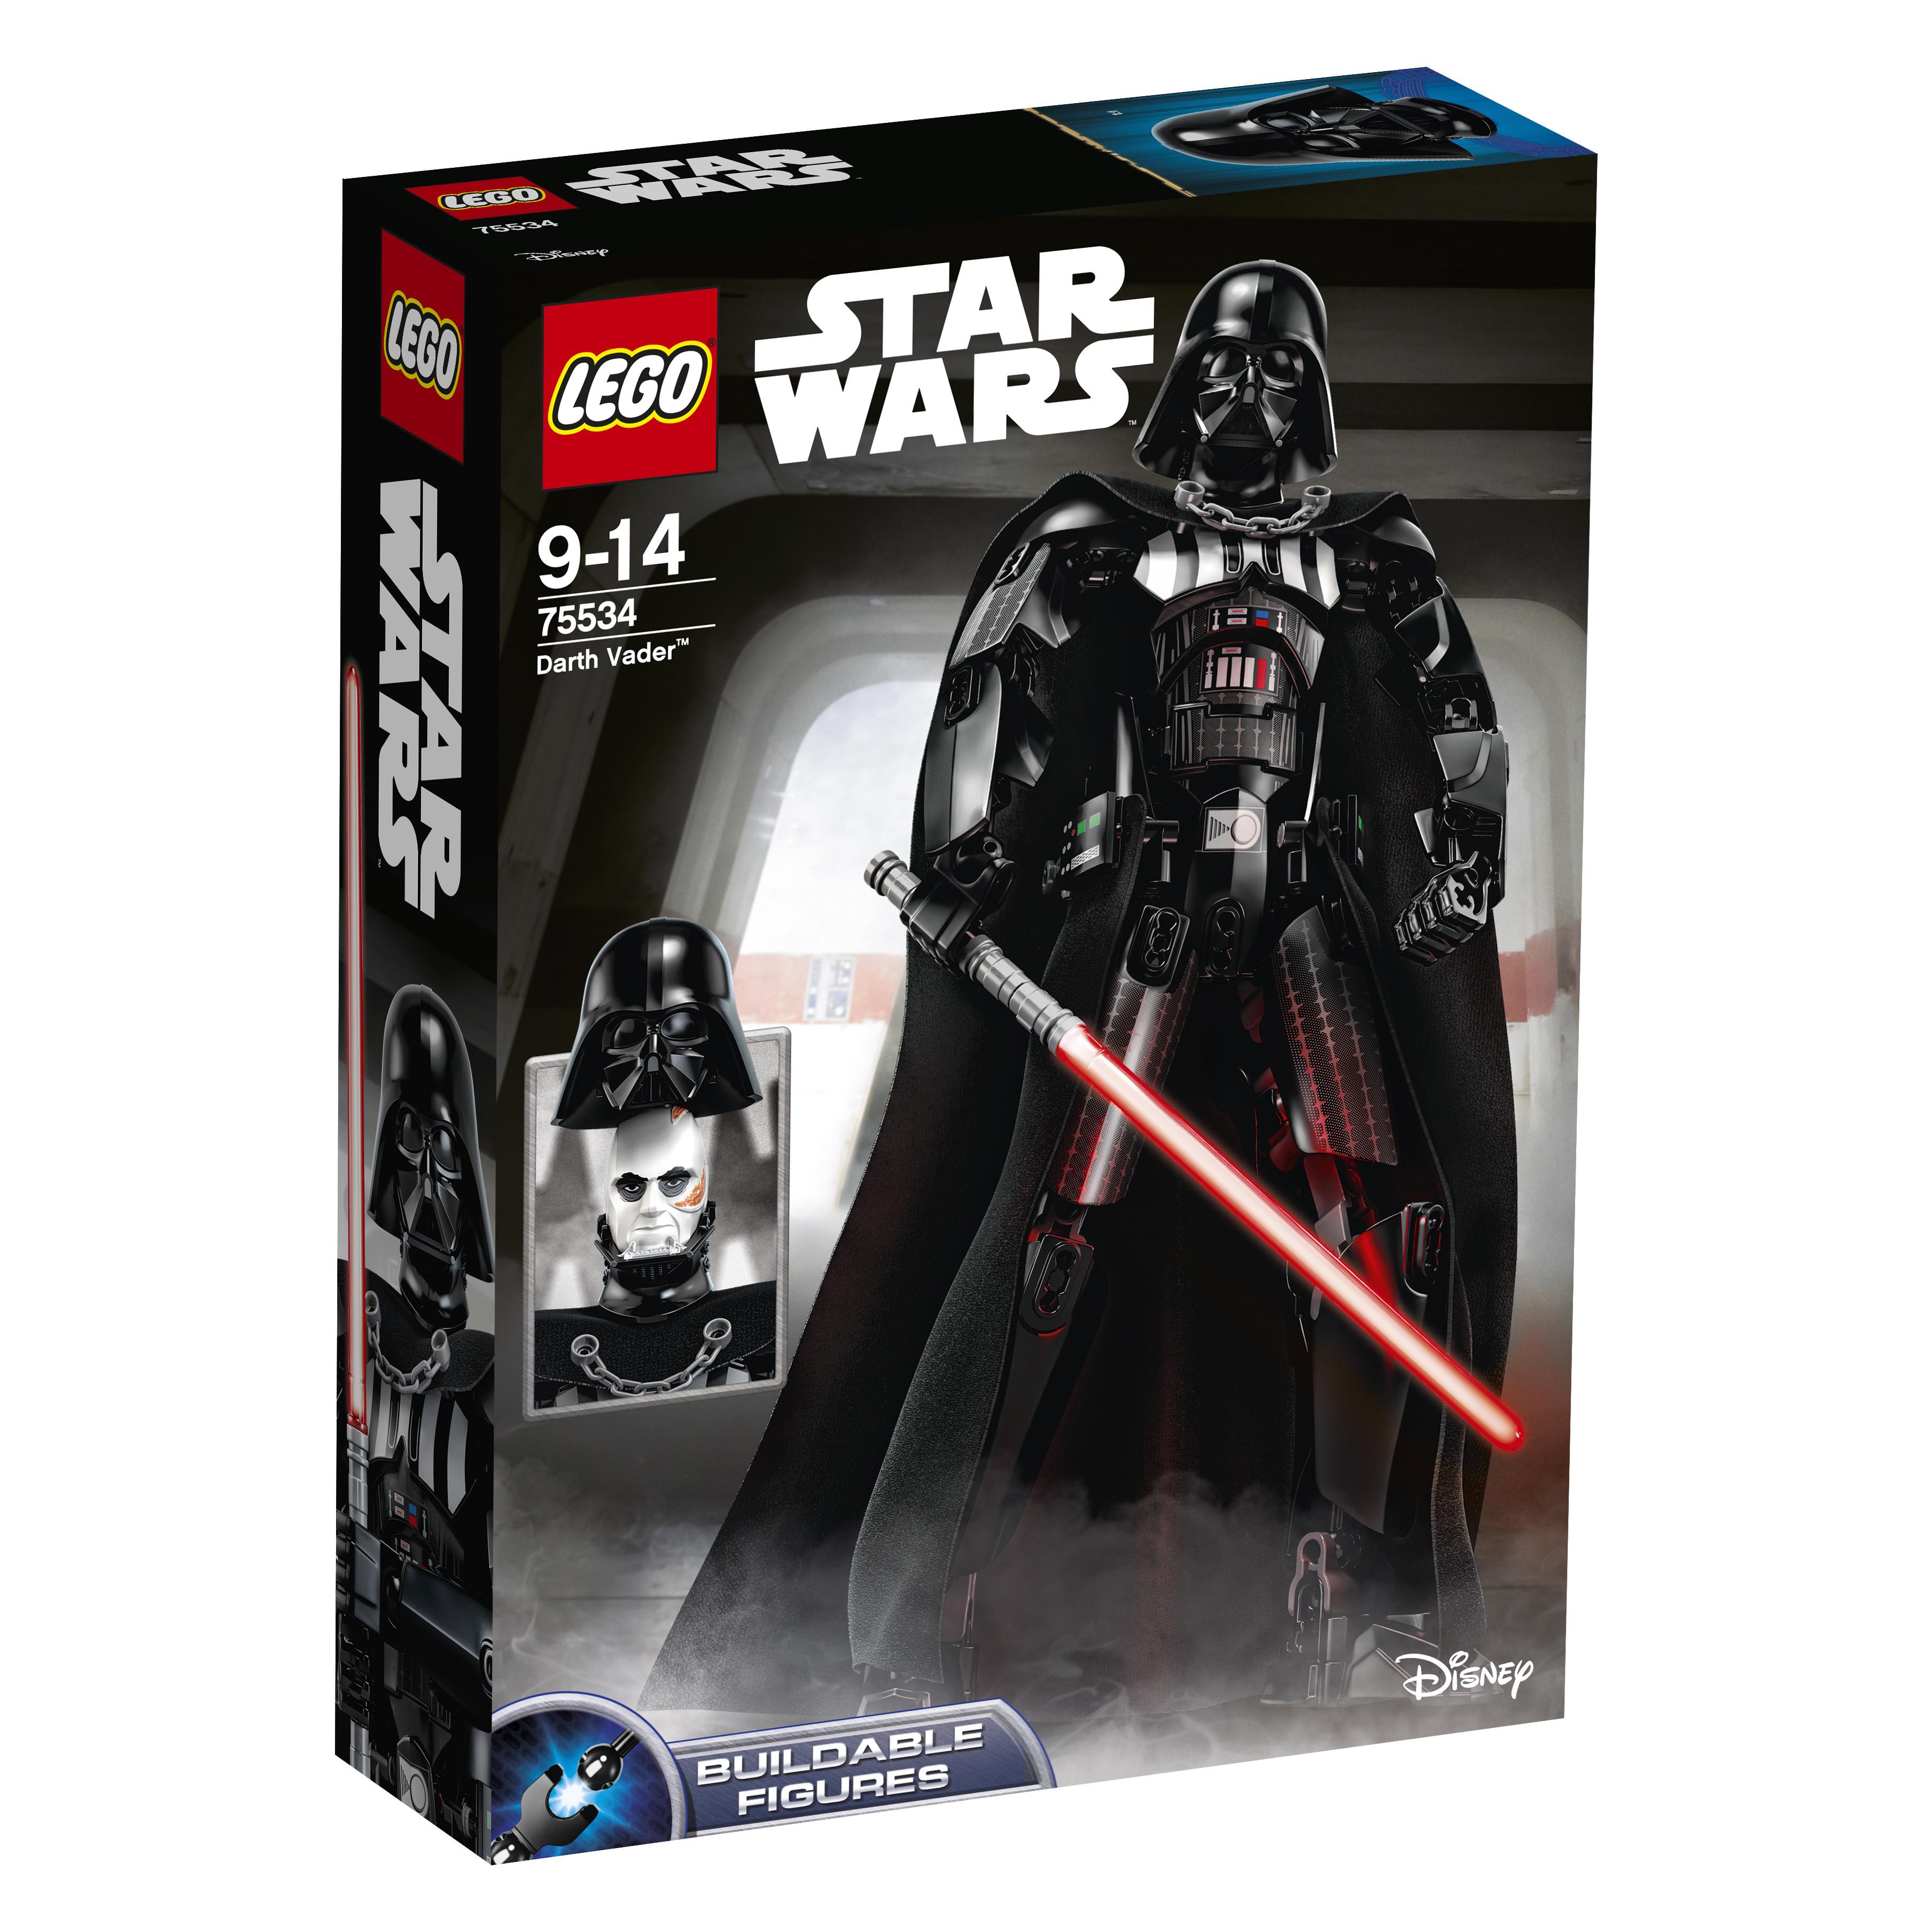 Star Wars LEGO Constraction Star Wars 75534 Дарт Вейдер